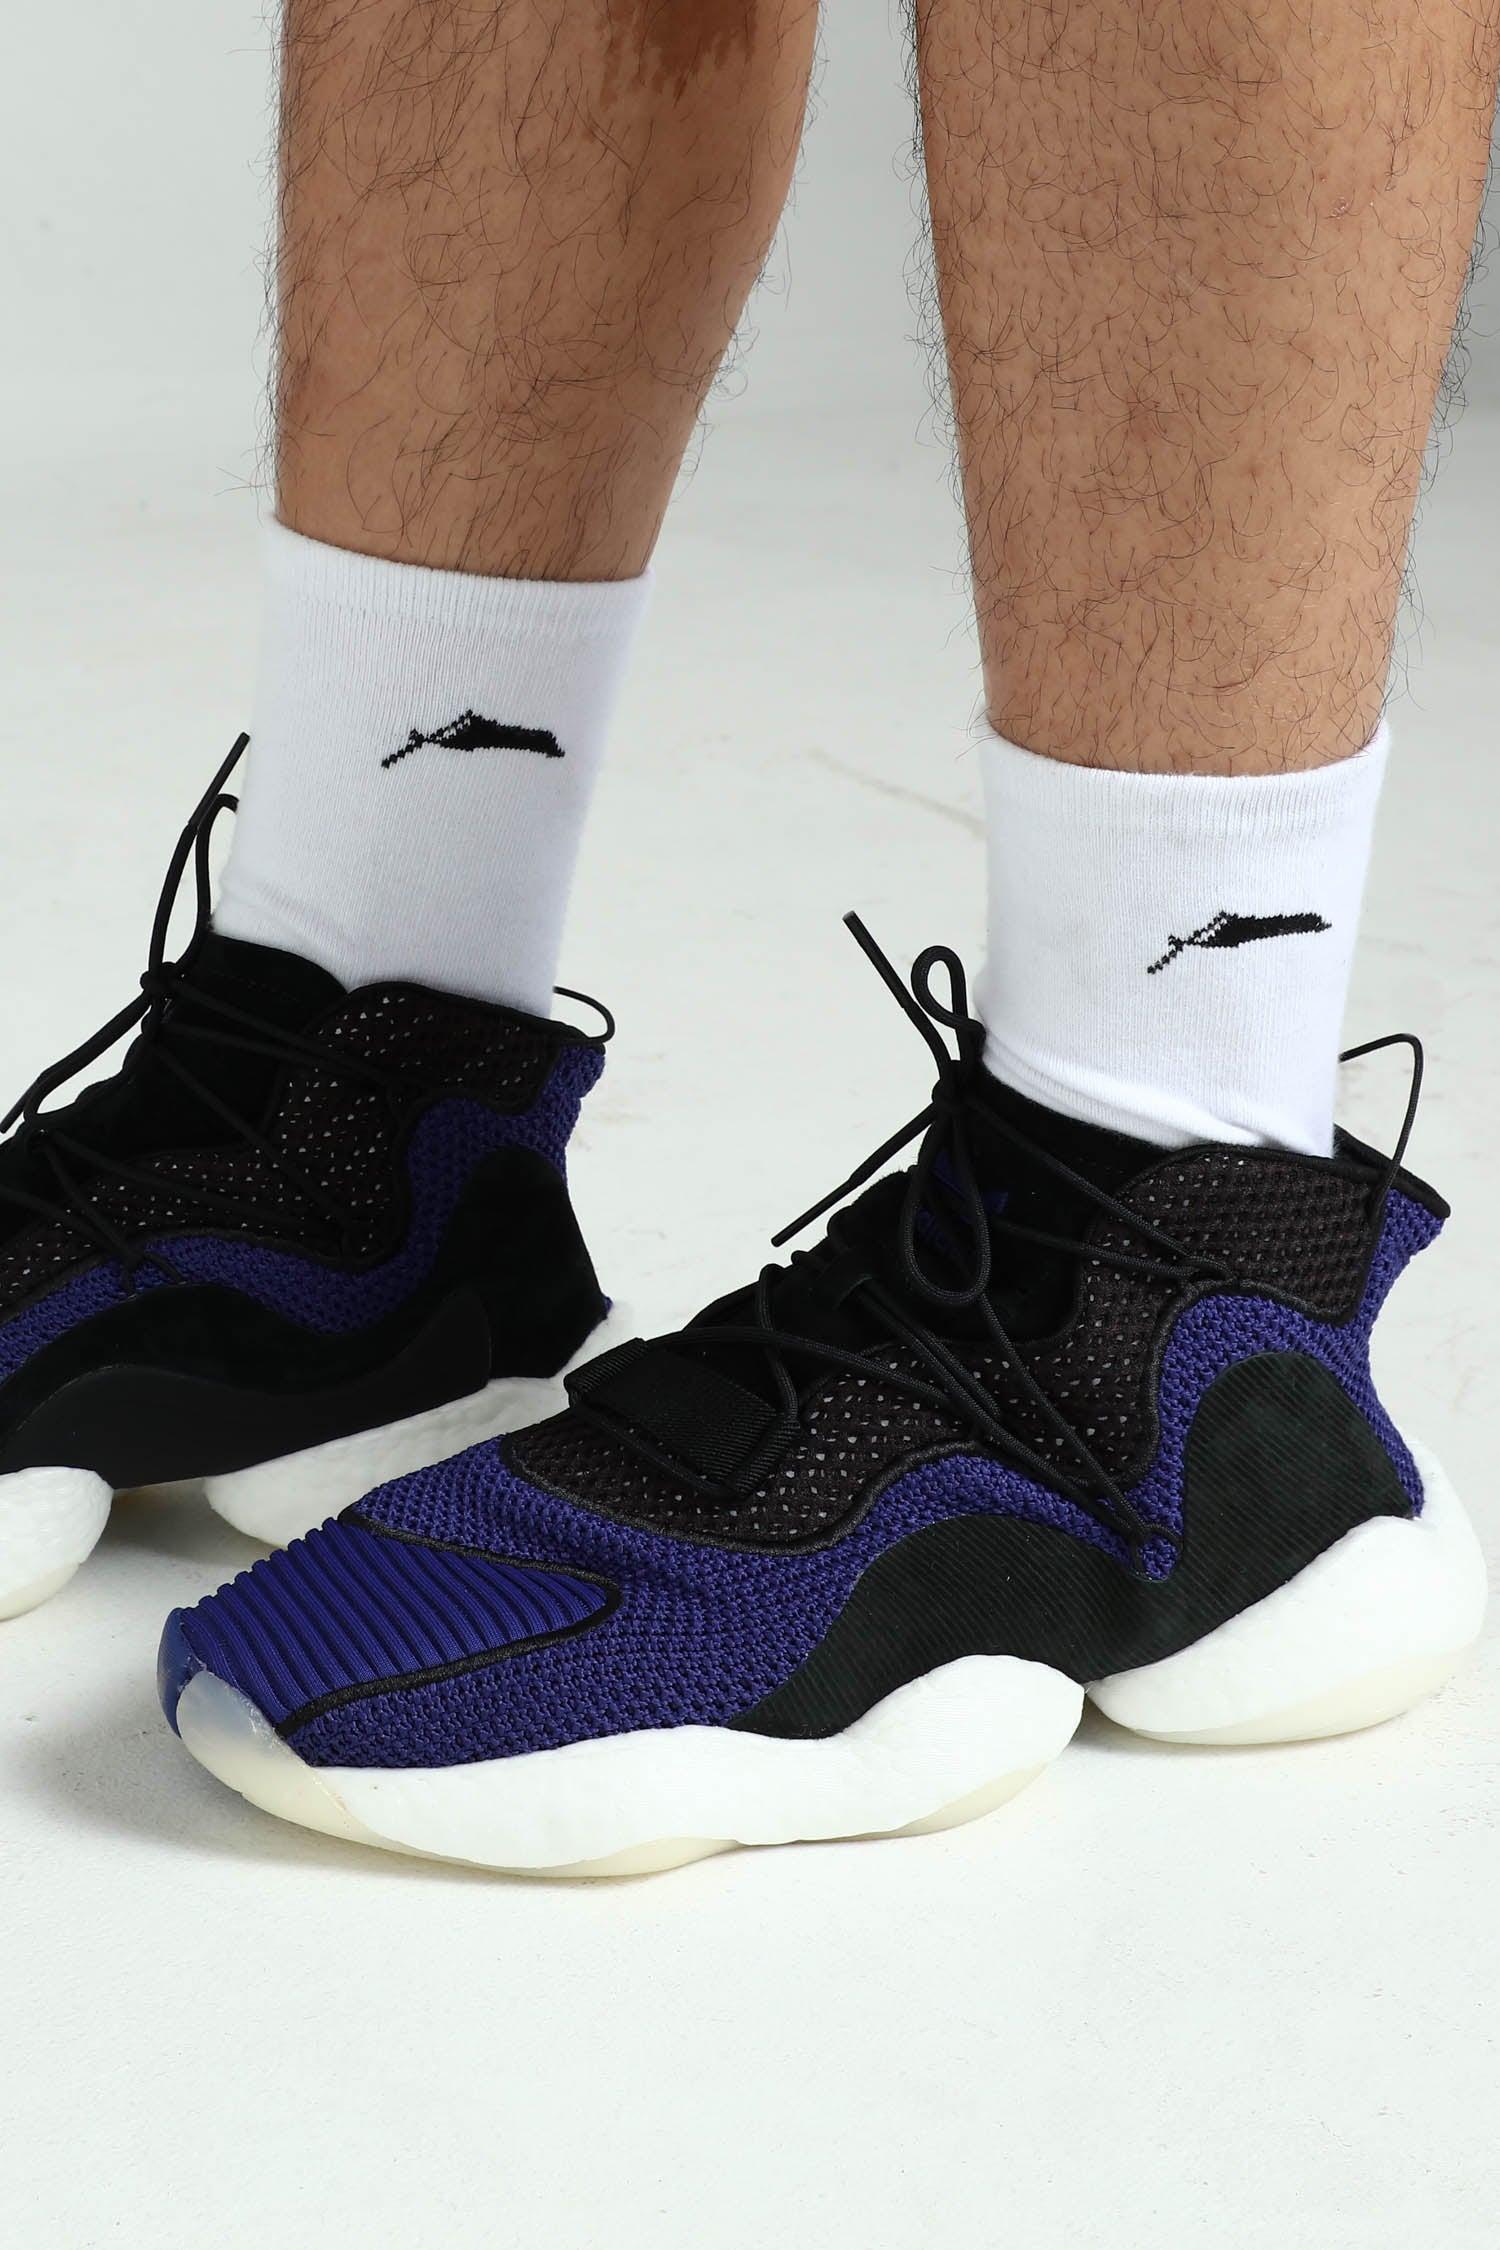 Crazy by adidas Originals Shoes & Sneakers | adidas US